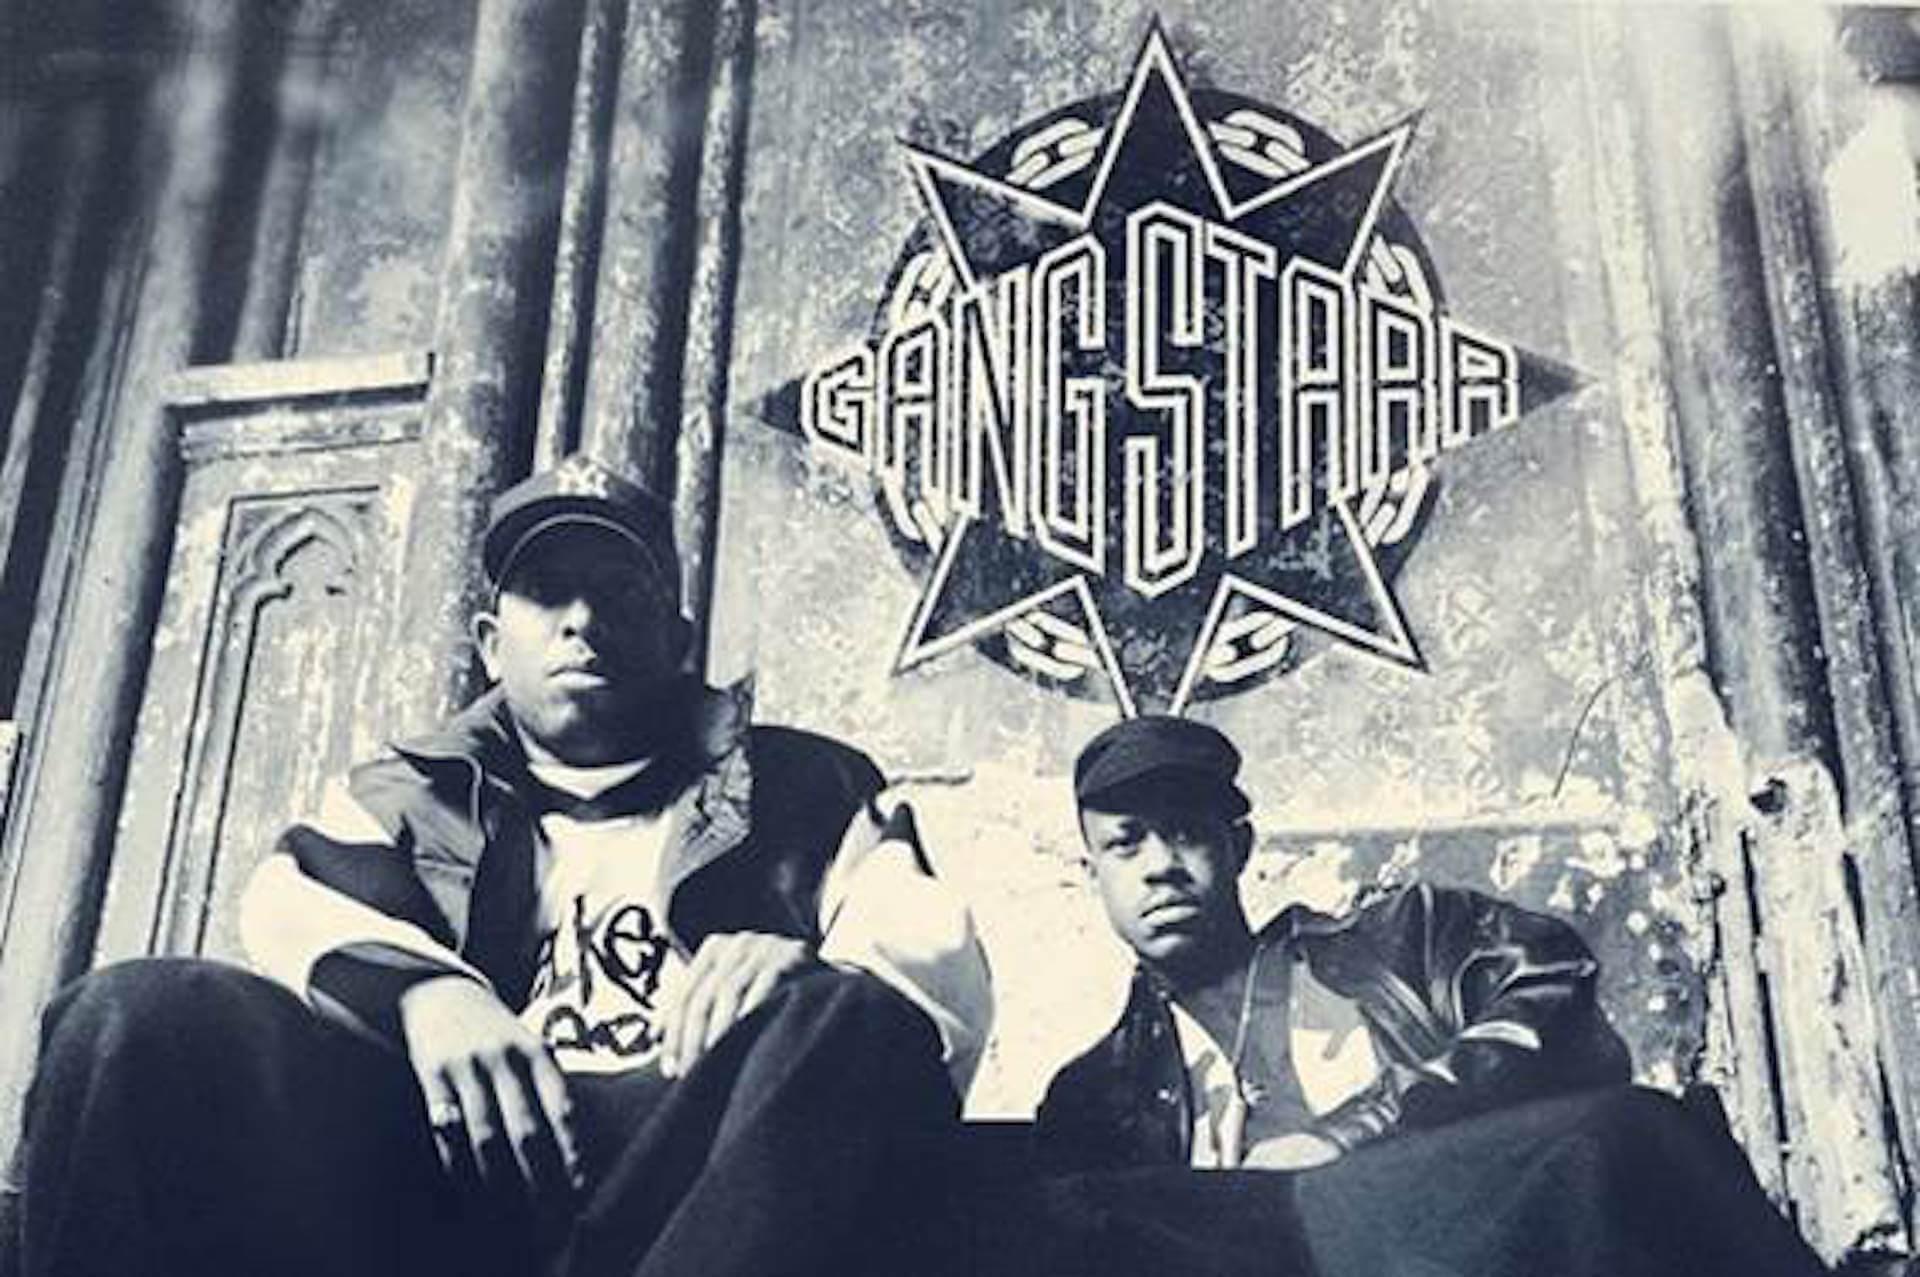 Gang Starr、16年ぶりのアルバム『One Of The Best Yet』がリリース J. Cole、Q-Tip、Ne-Yo、Talib Kweliらが参加 music191101-gangstarr-1